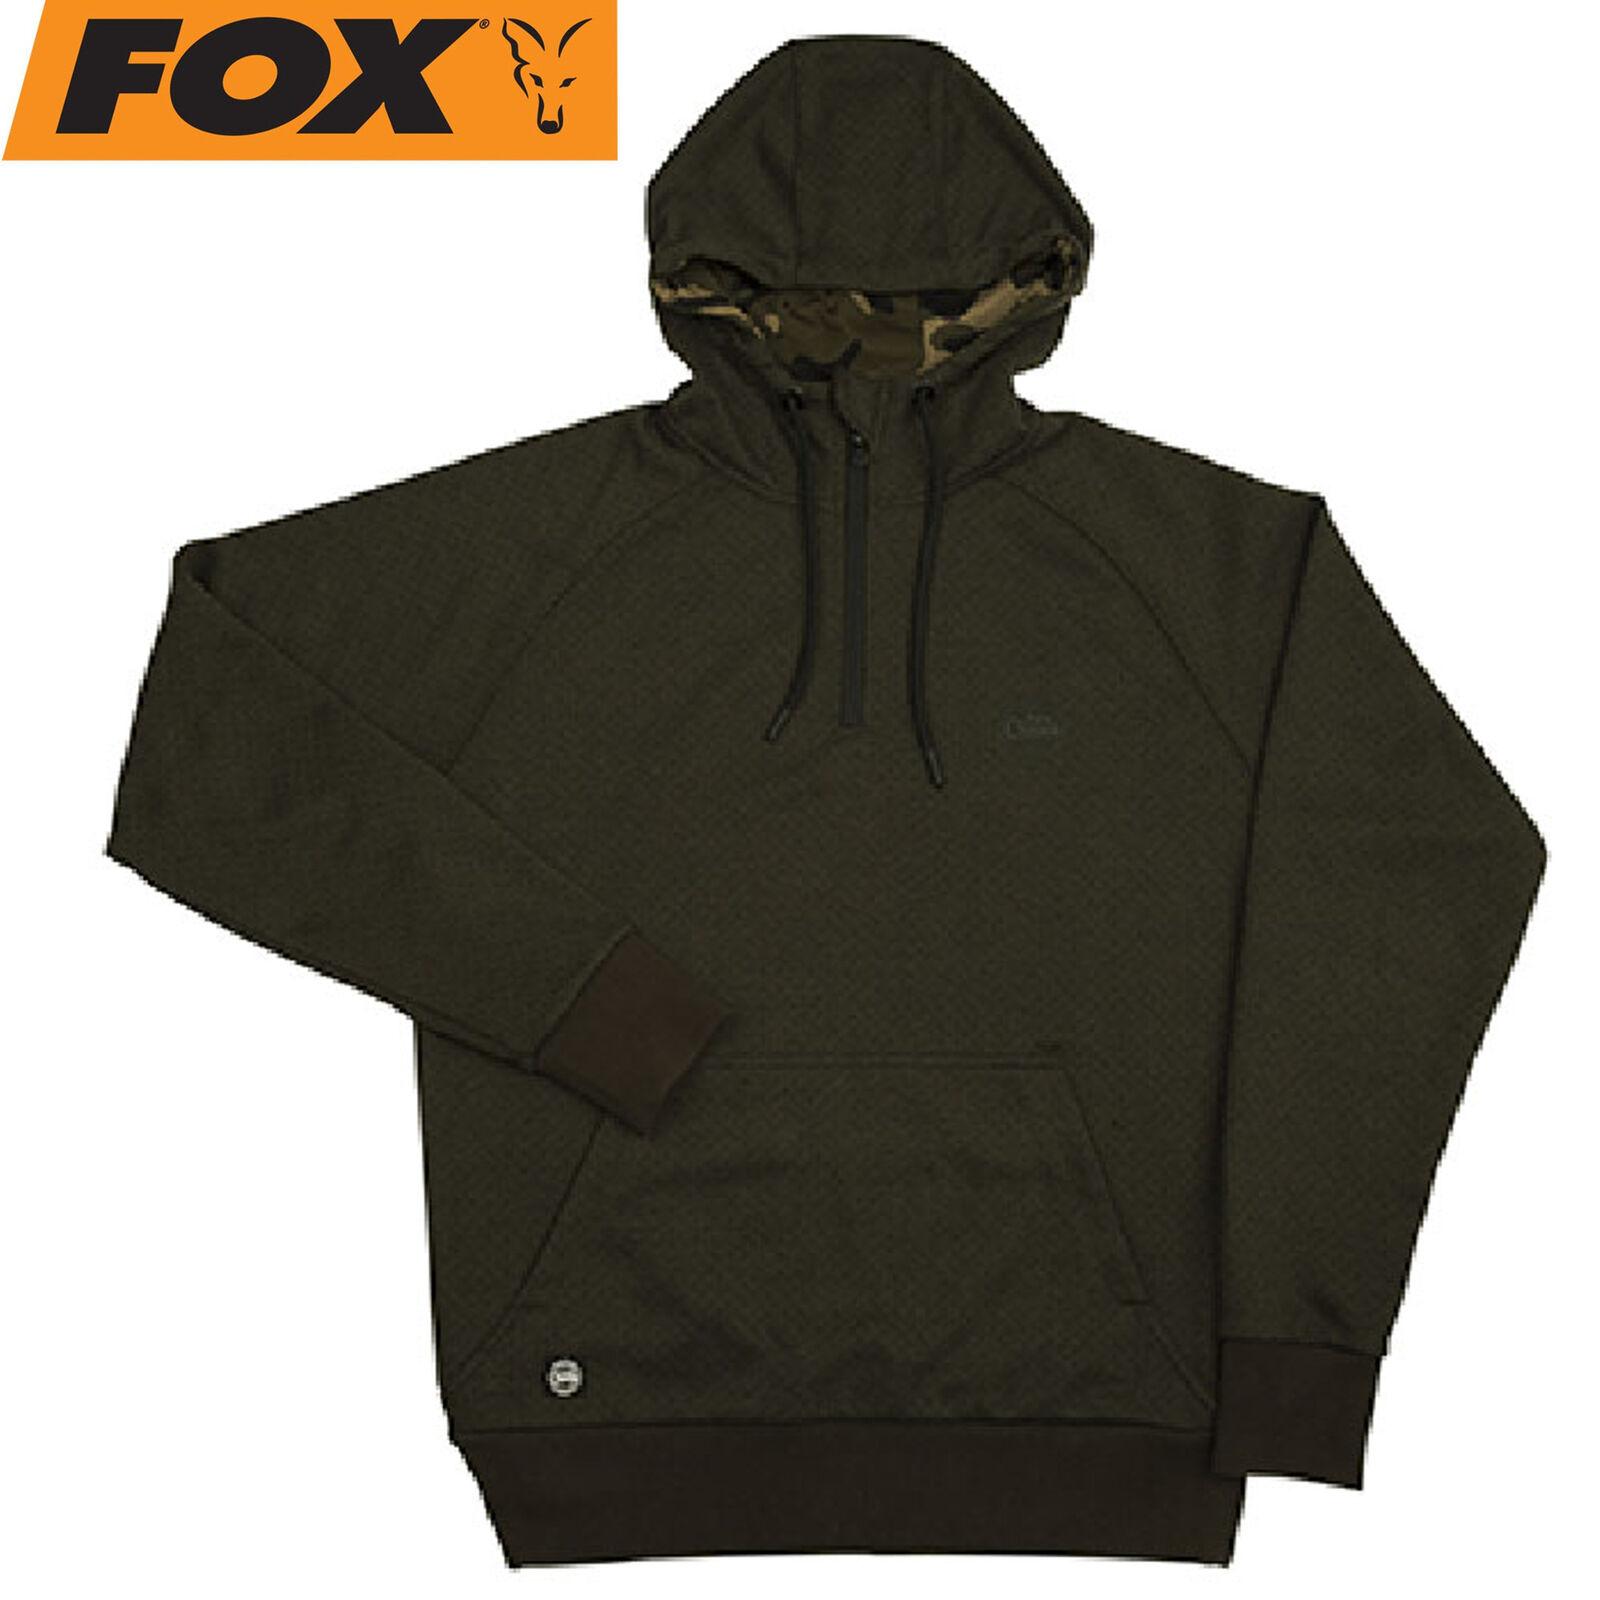 Jacken & Mäntel Bekleidung Fox Chunk Olive Steppjacke/Karpfenangeln